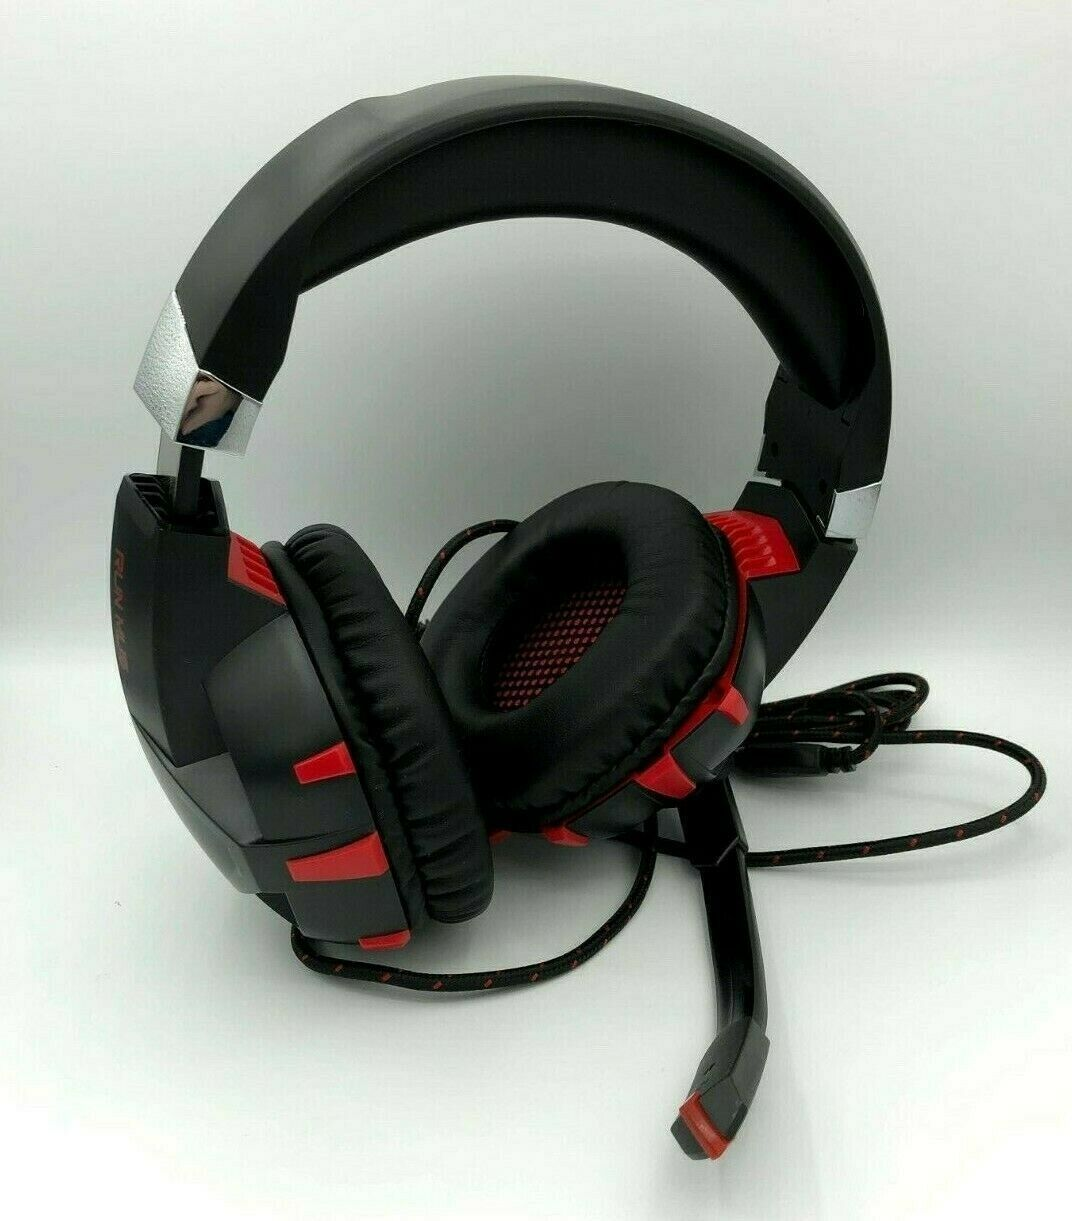 K2 Gaming Headset 7.1 Channel Stereo USB Headphone Earphone w// Mic for PC Laptop